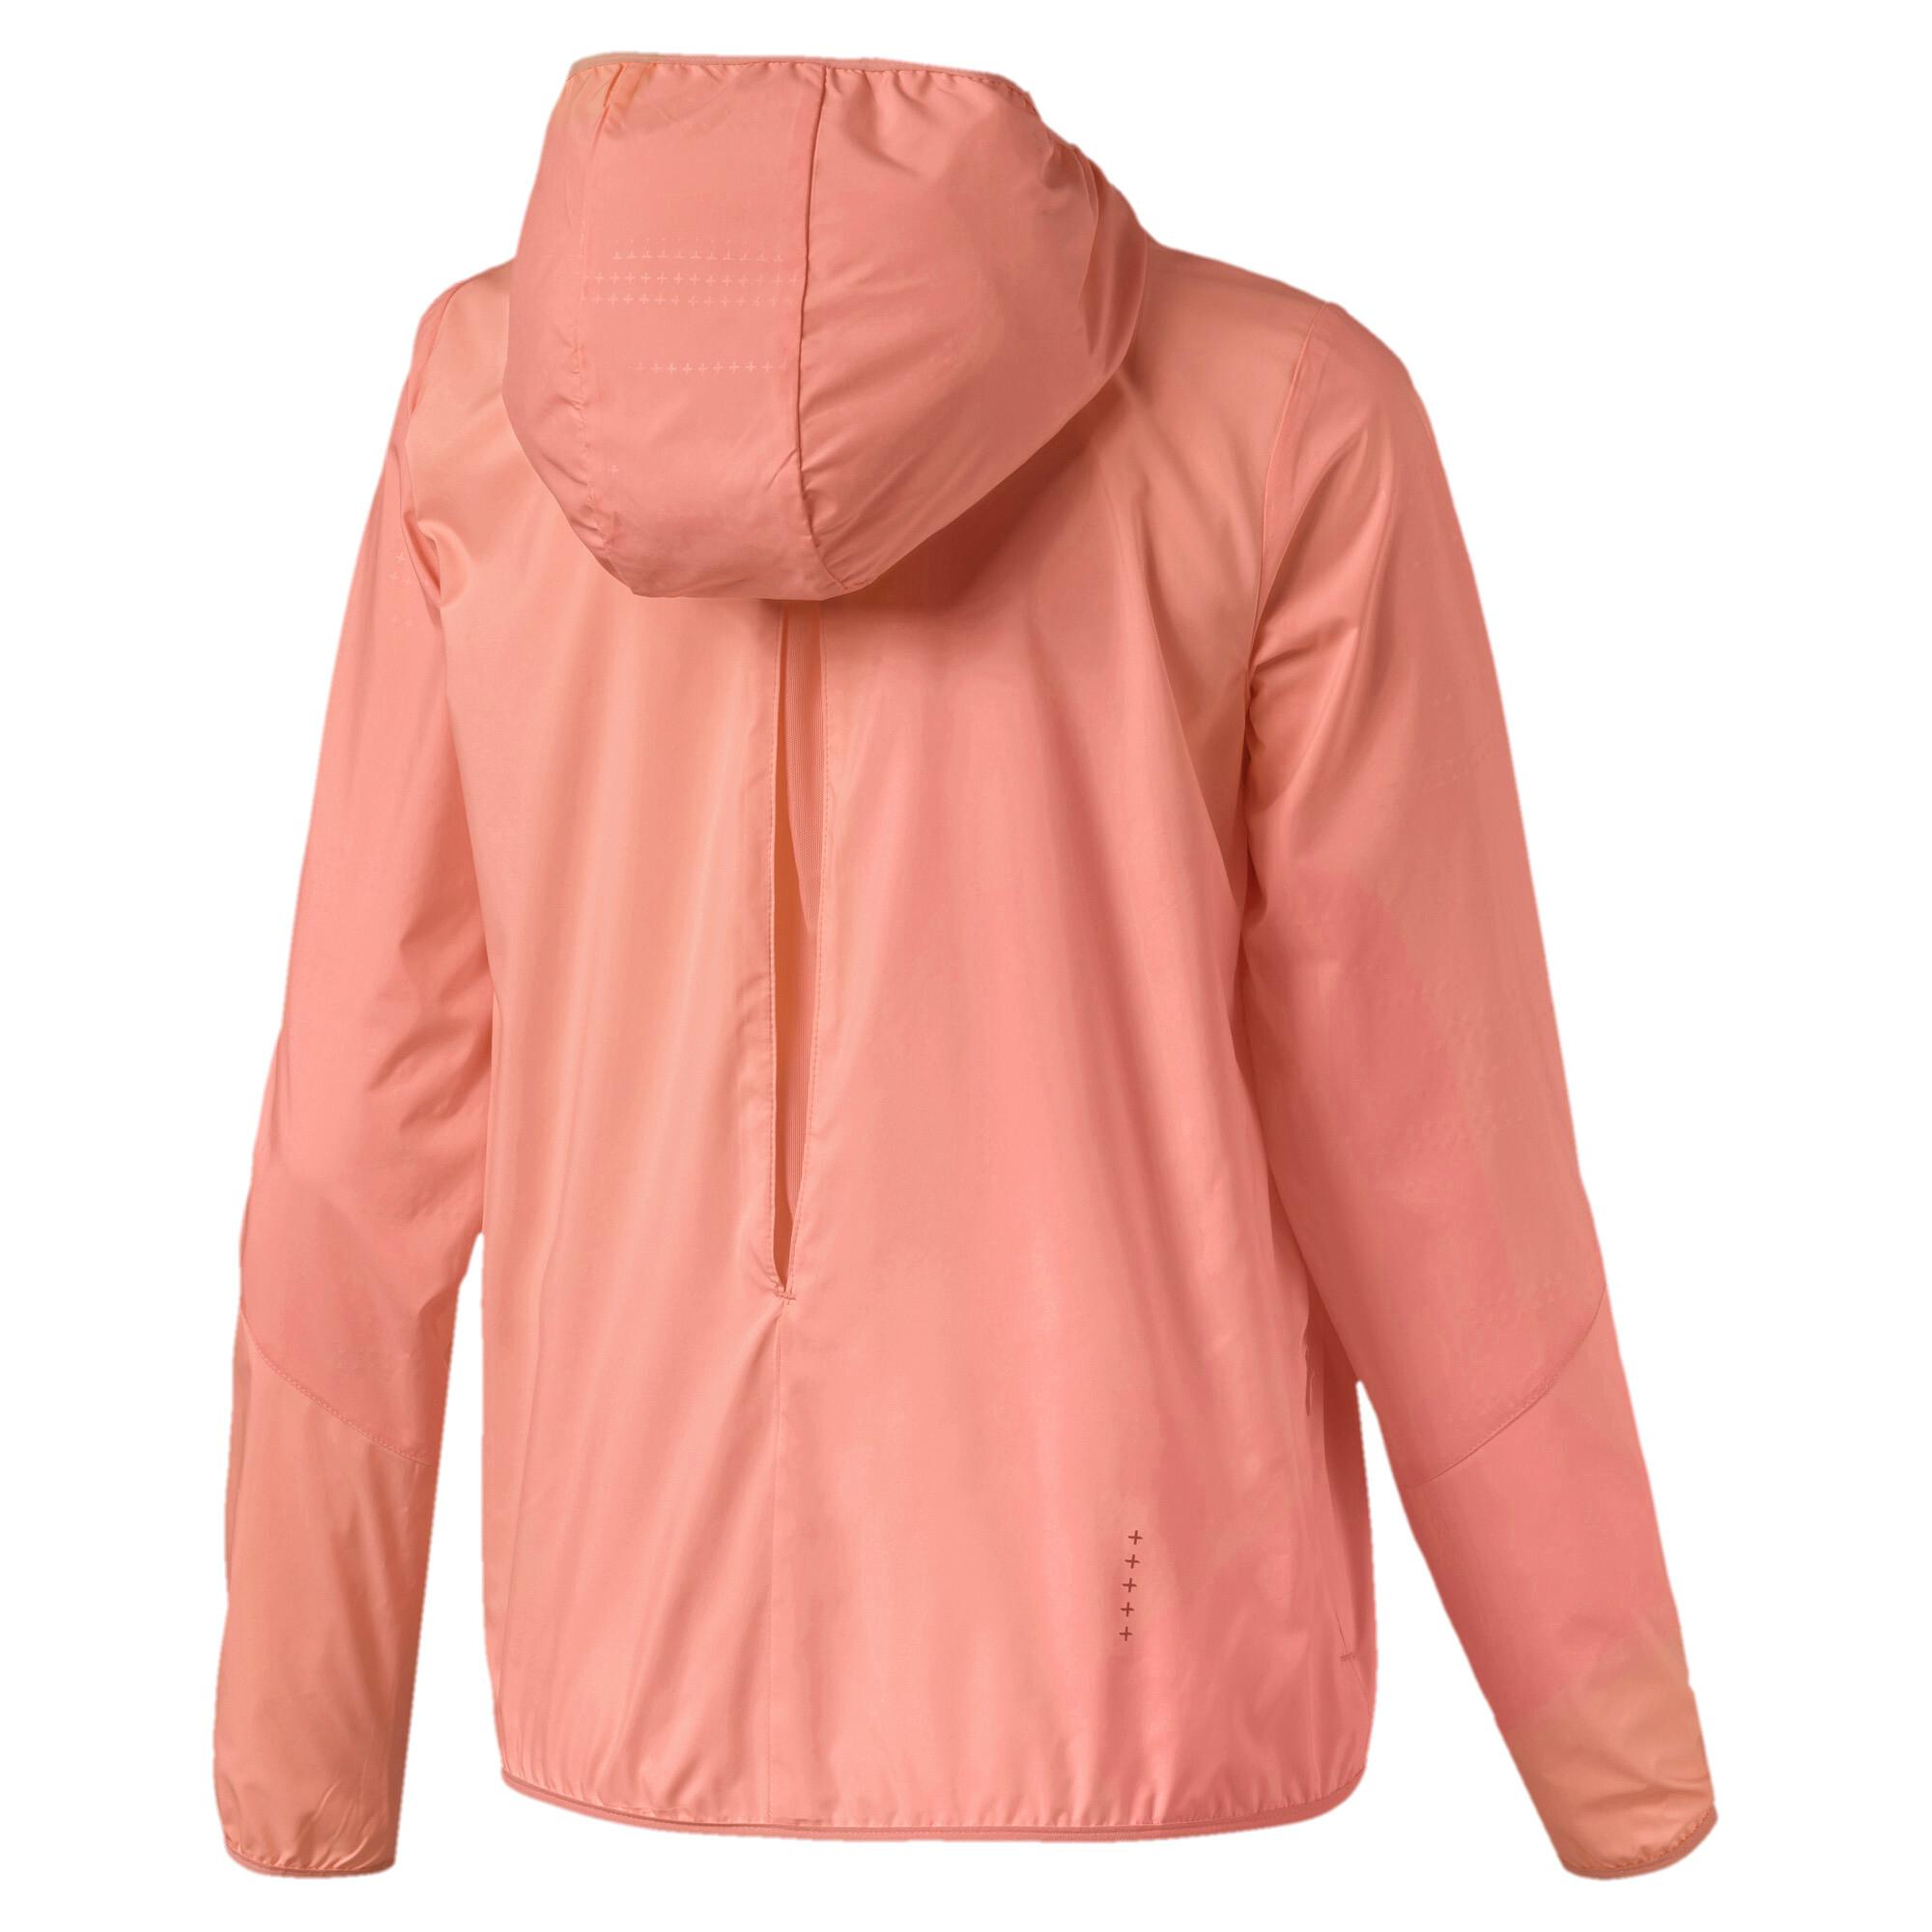 Image Puma Ignite Woven Hooded Women's Running Track Jacket #5